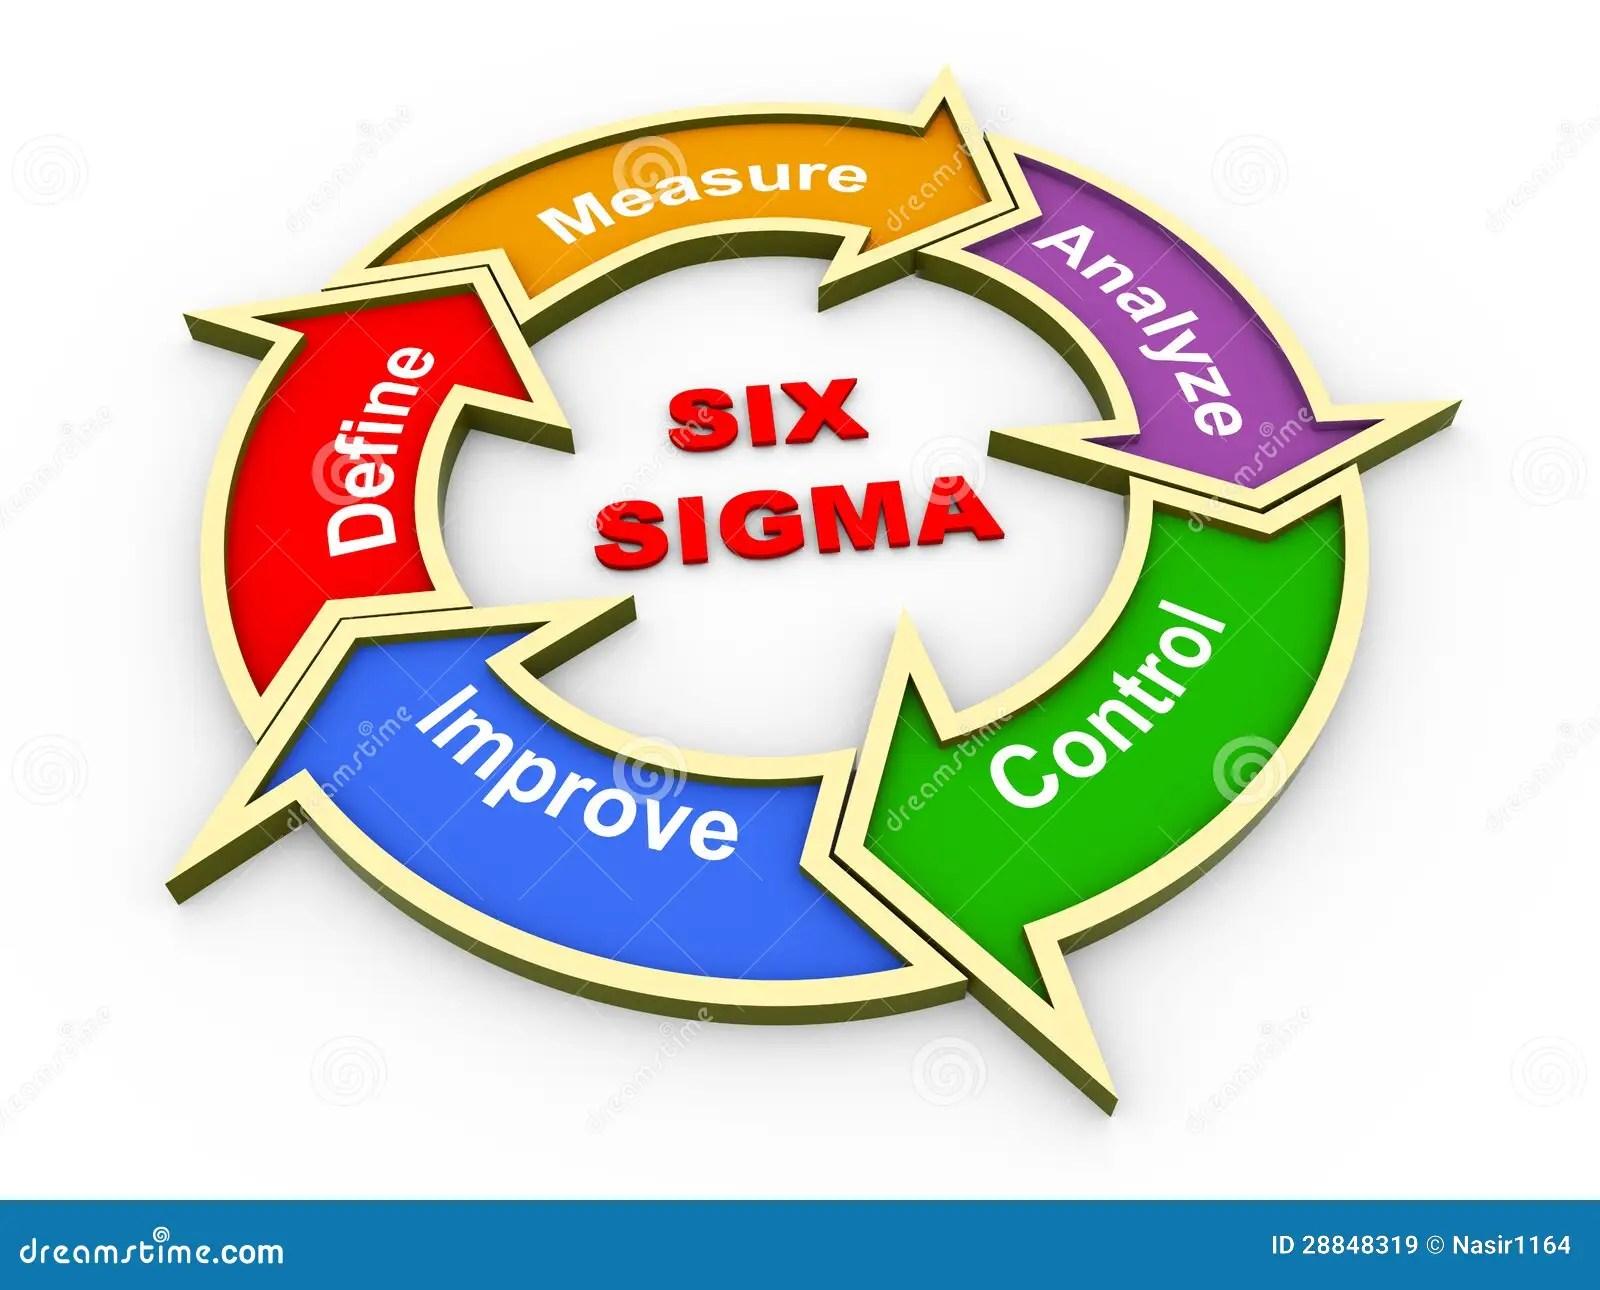 house of quality six sigma diagram bazooka bta850fh wiring 3d flow chart stock illustration